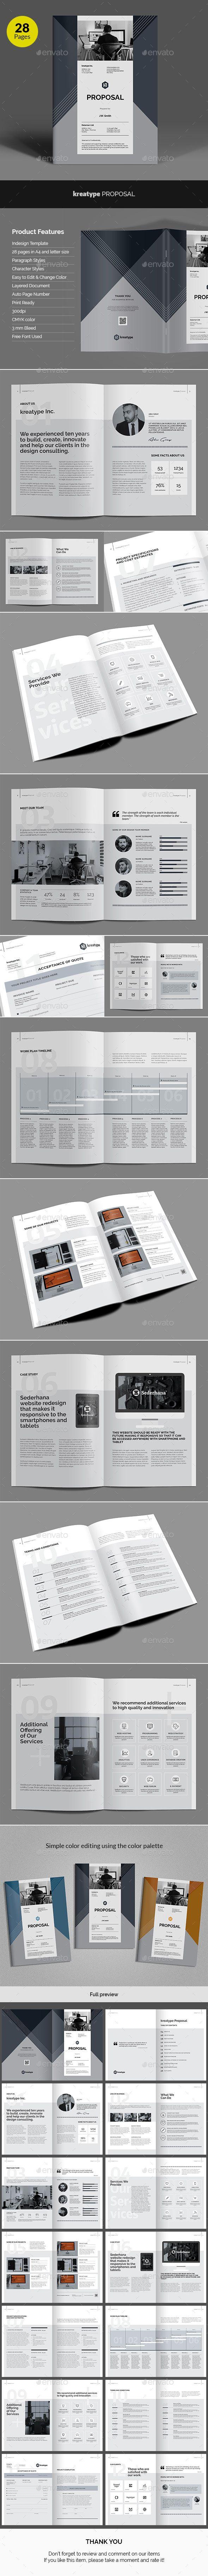 Kreatype Business Proposal v02 | Business proposal template ...